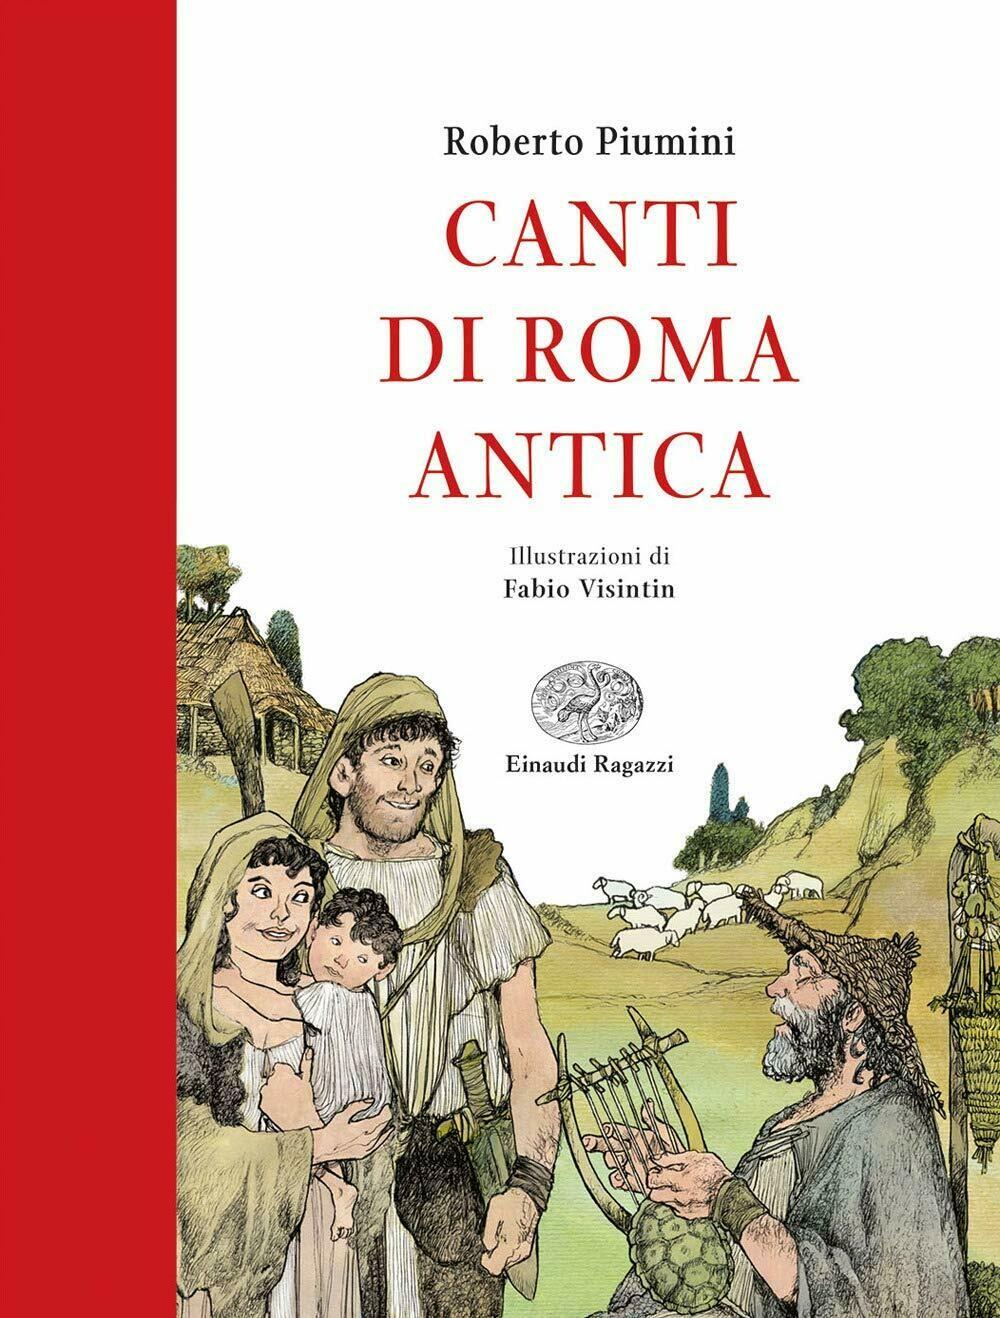 Canti di Roma antica